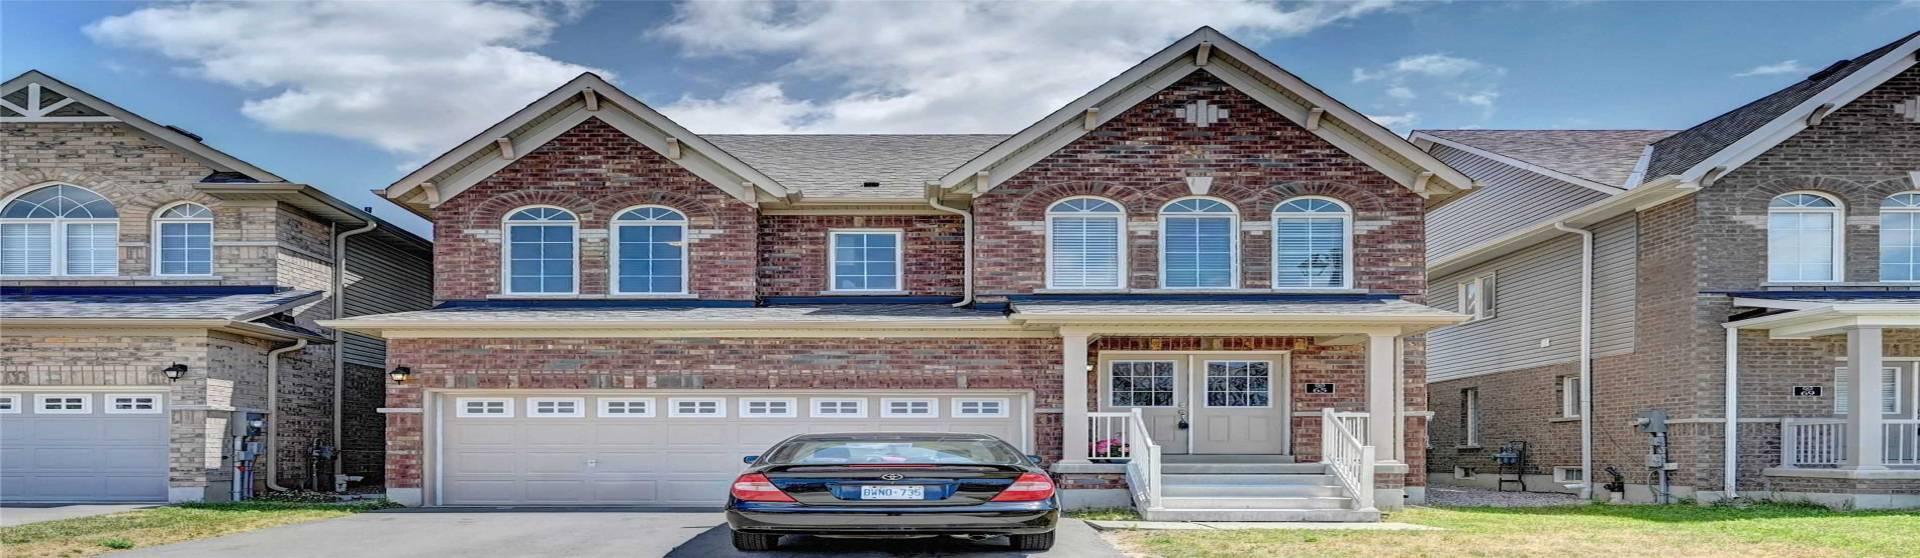 65 Duckworth Rd- Cambridge- Ontario N3H 0B9, 4 Bedrooms Bedrooms, 8 Rooms Rooms,3 BathroomsBathrooms,Detached,Sale,Duckworth,X4812884